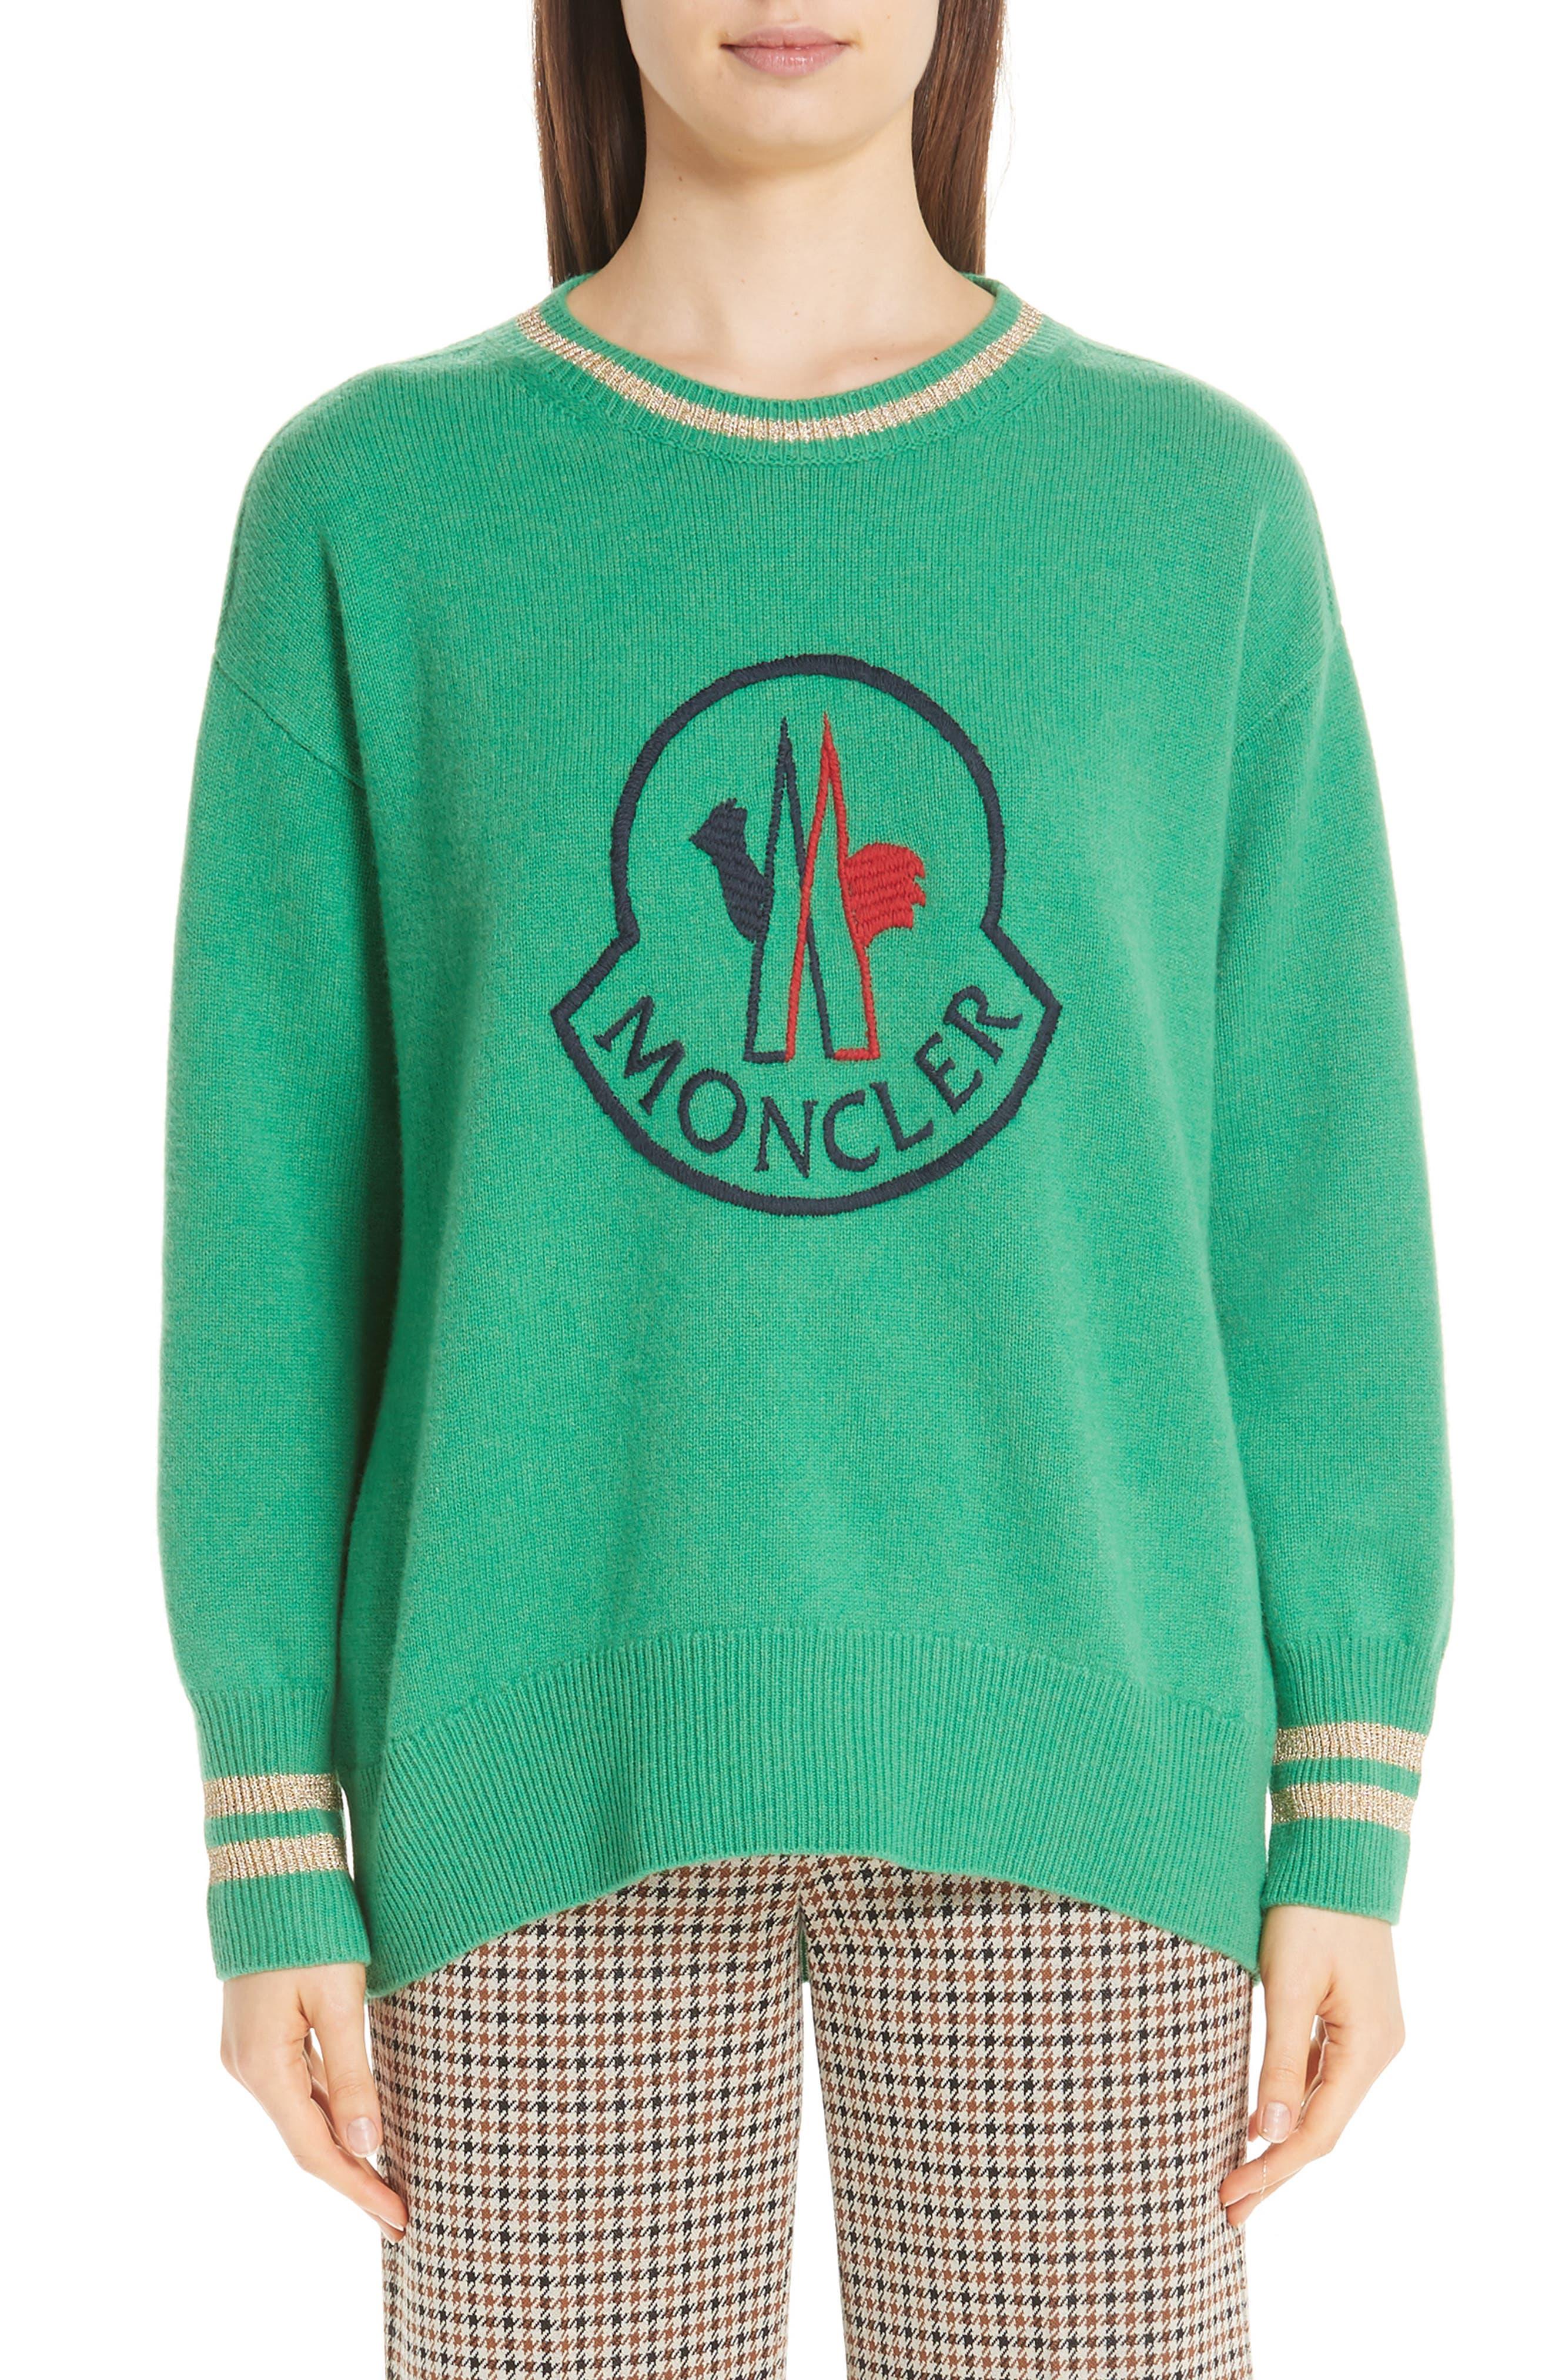 Moncler Logo Sweater, Green